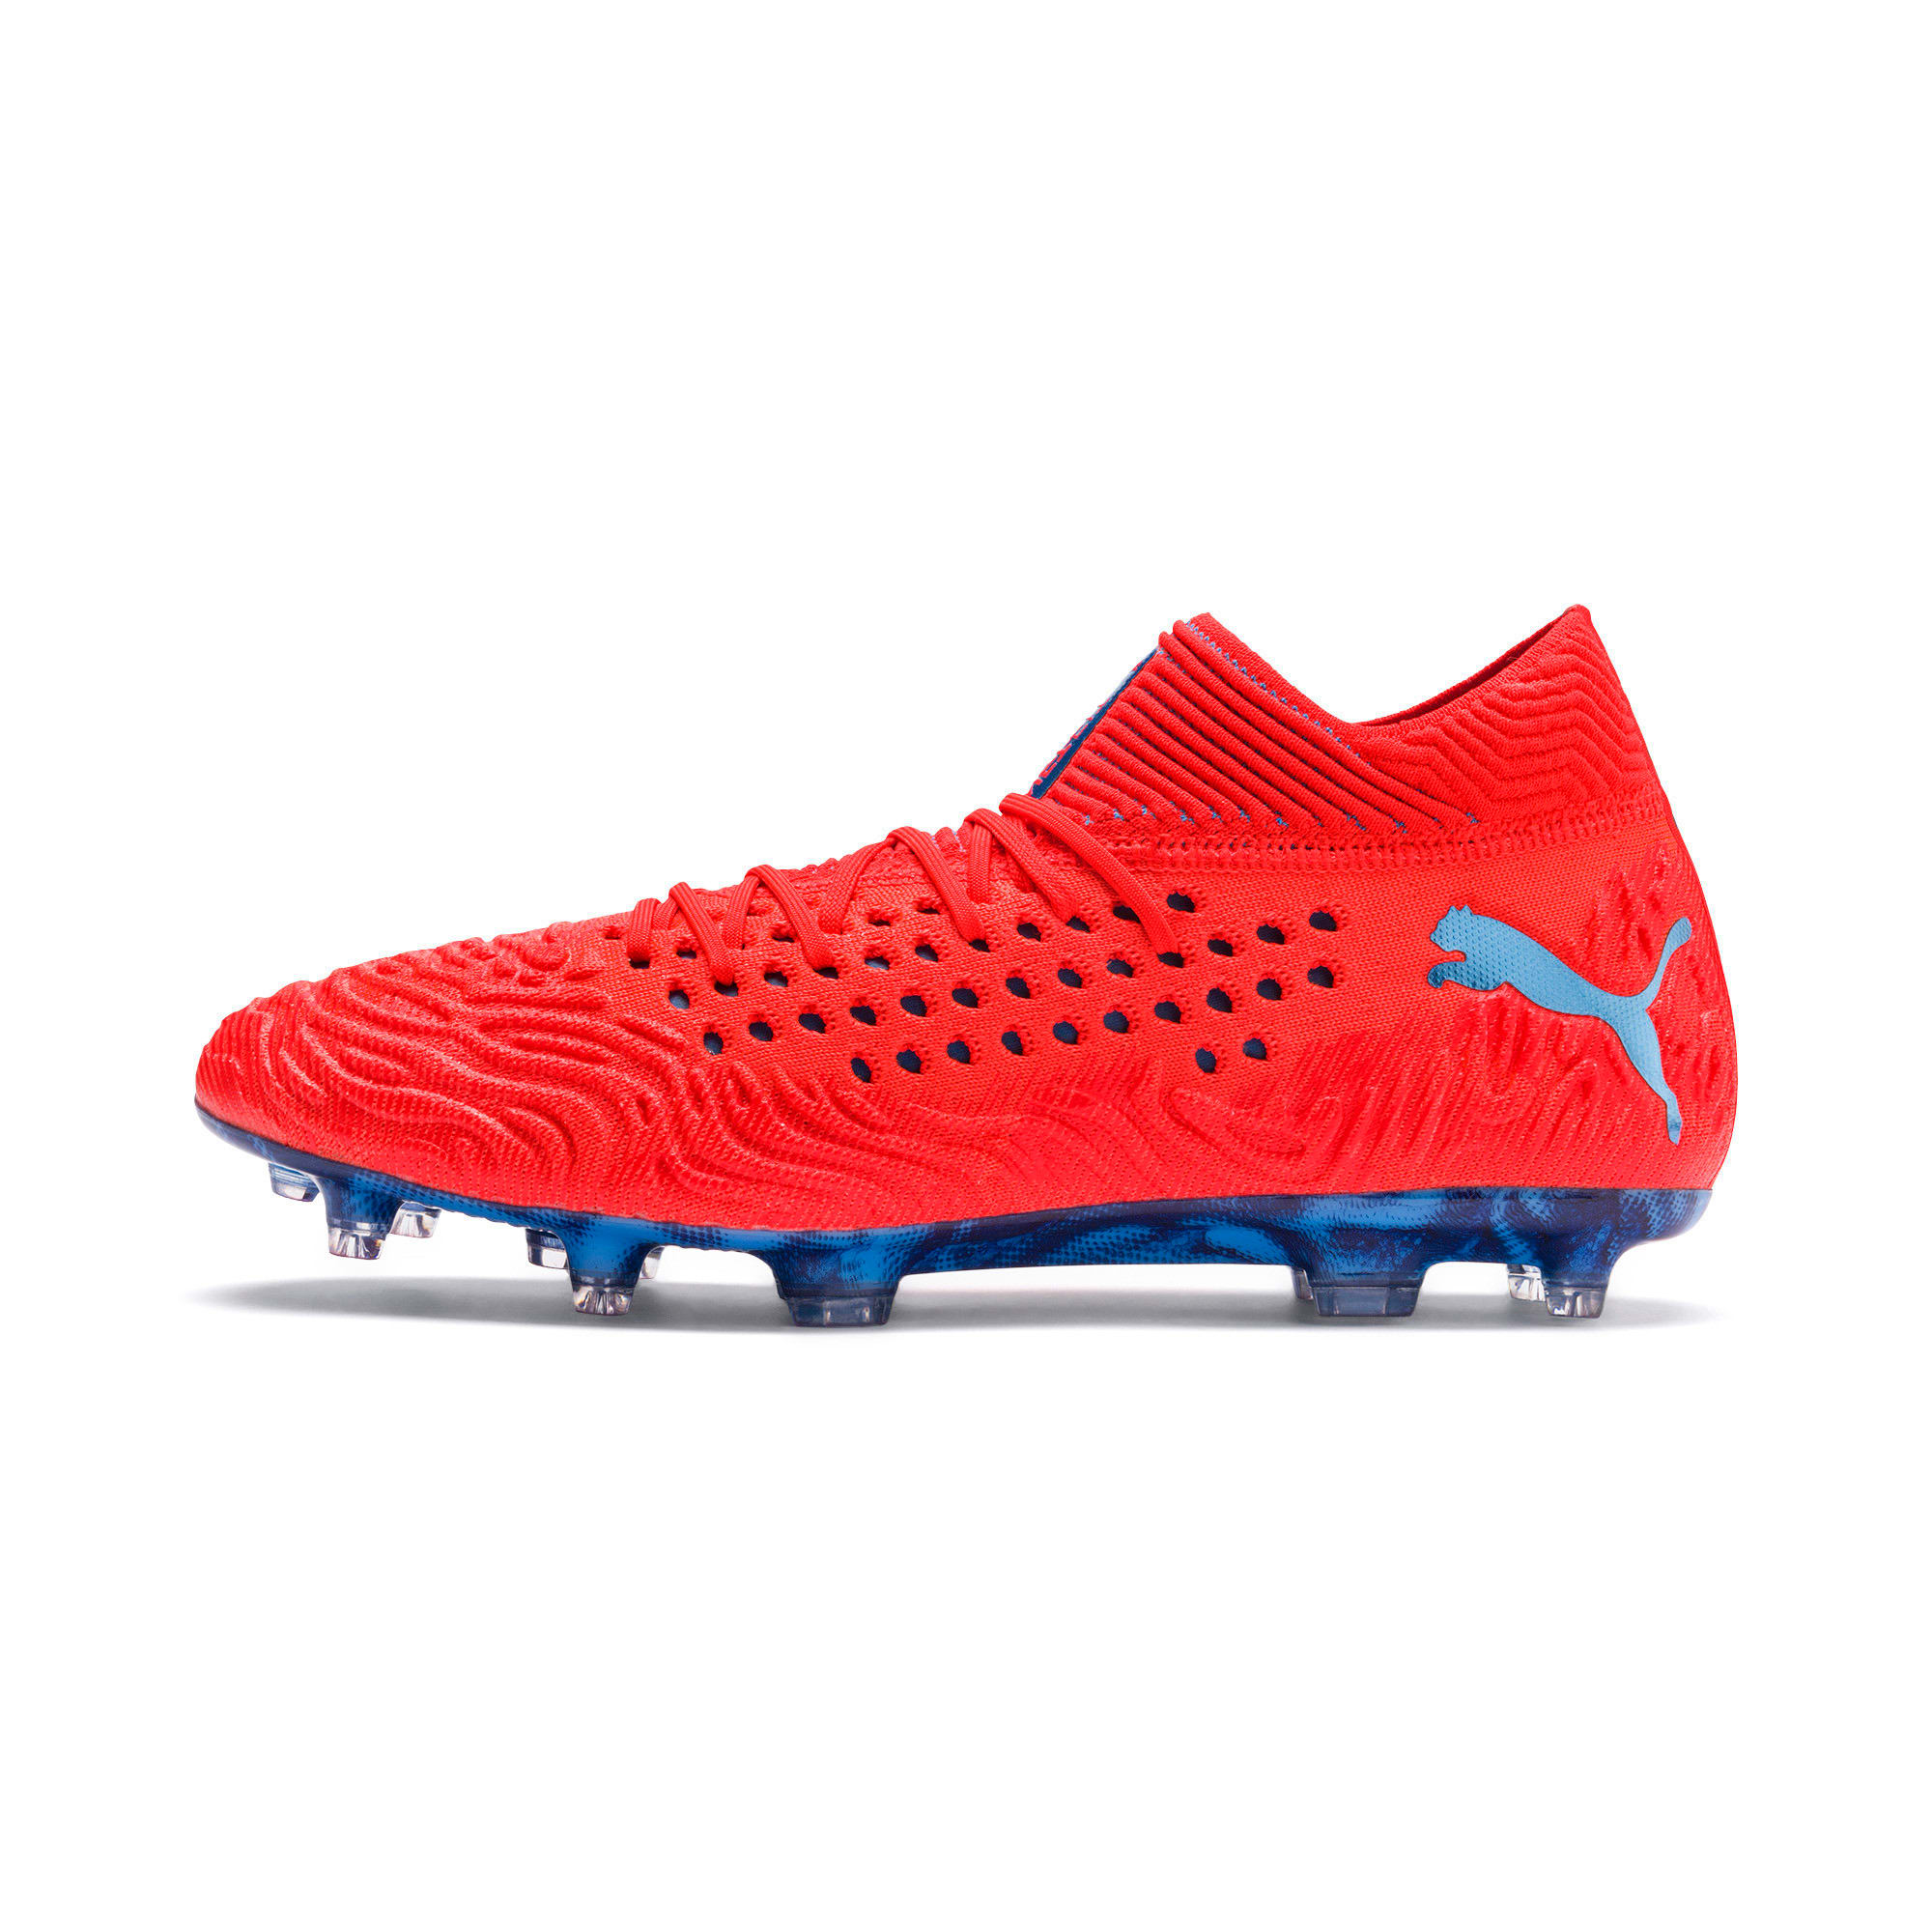 Thumbnail 1 of FUTURE 19.1 NETFIT FG/AG Men's Soccer Cleats, Red Blast-Bleu Azur, medium